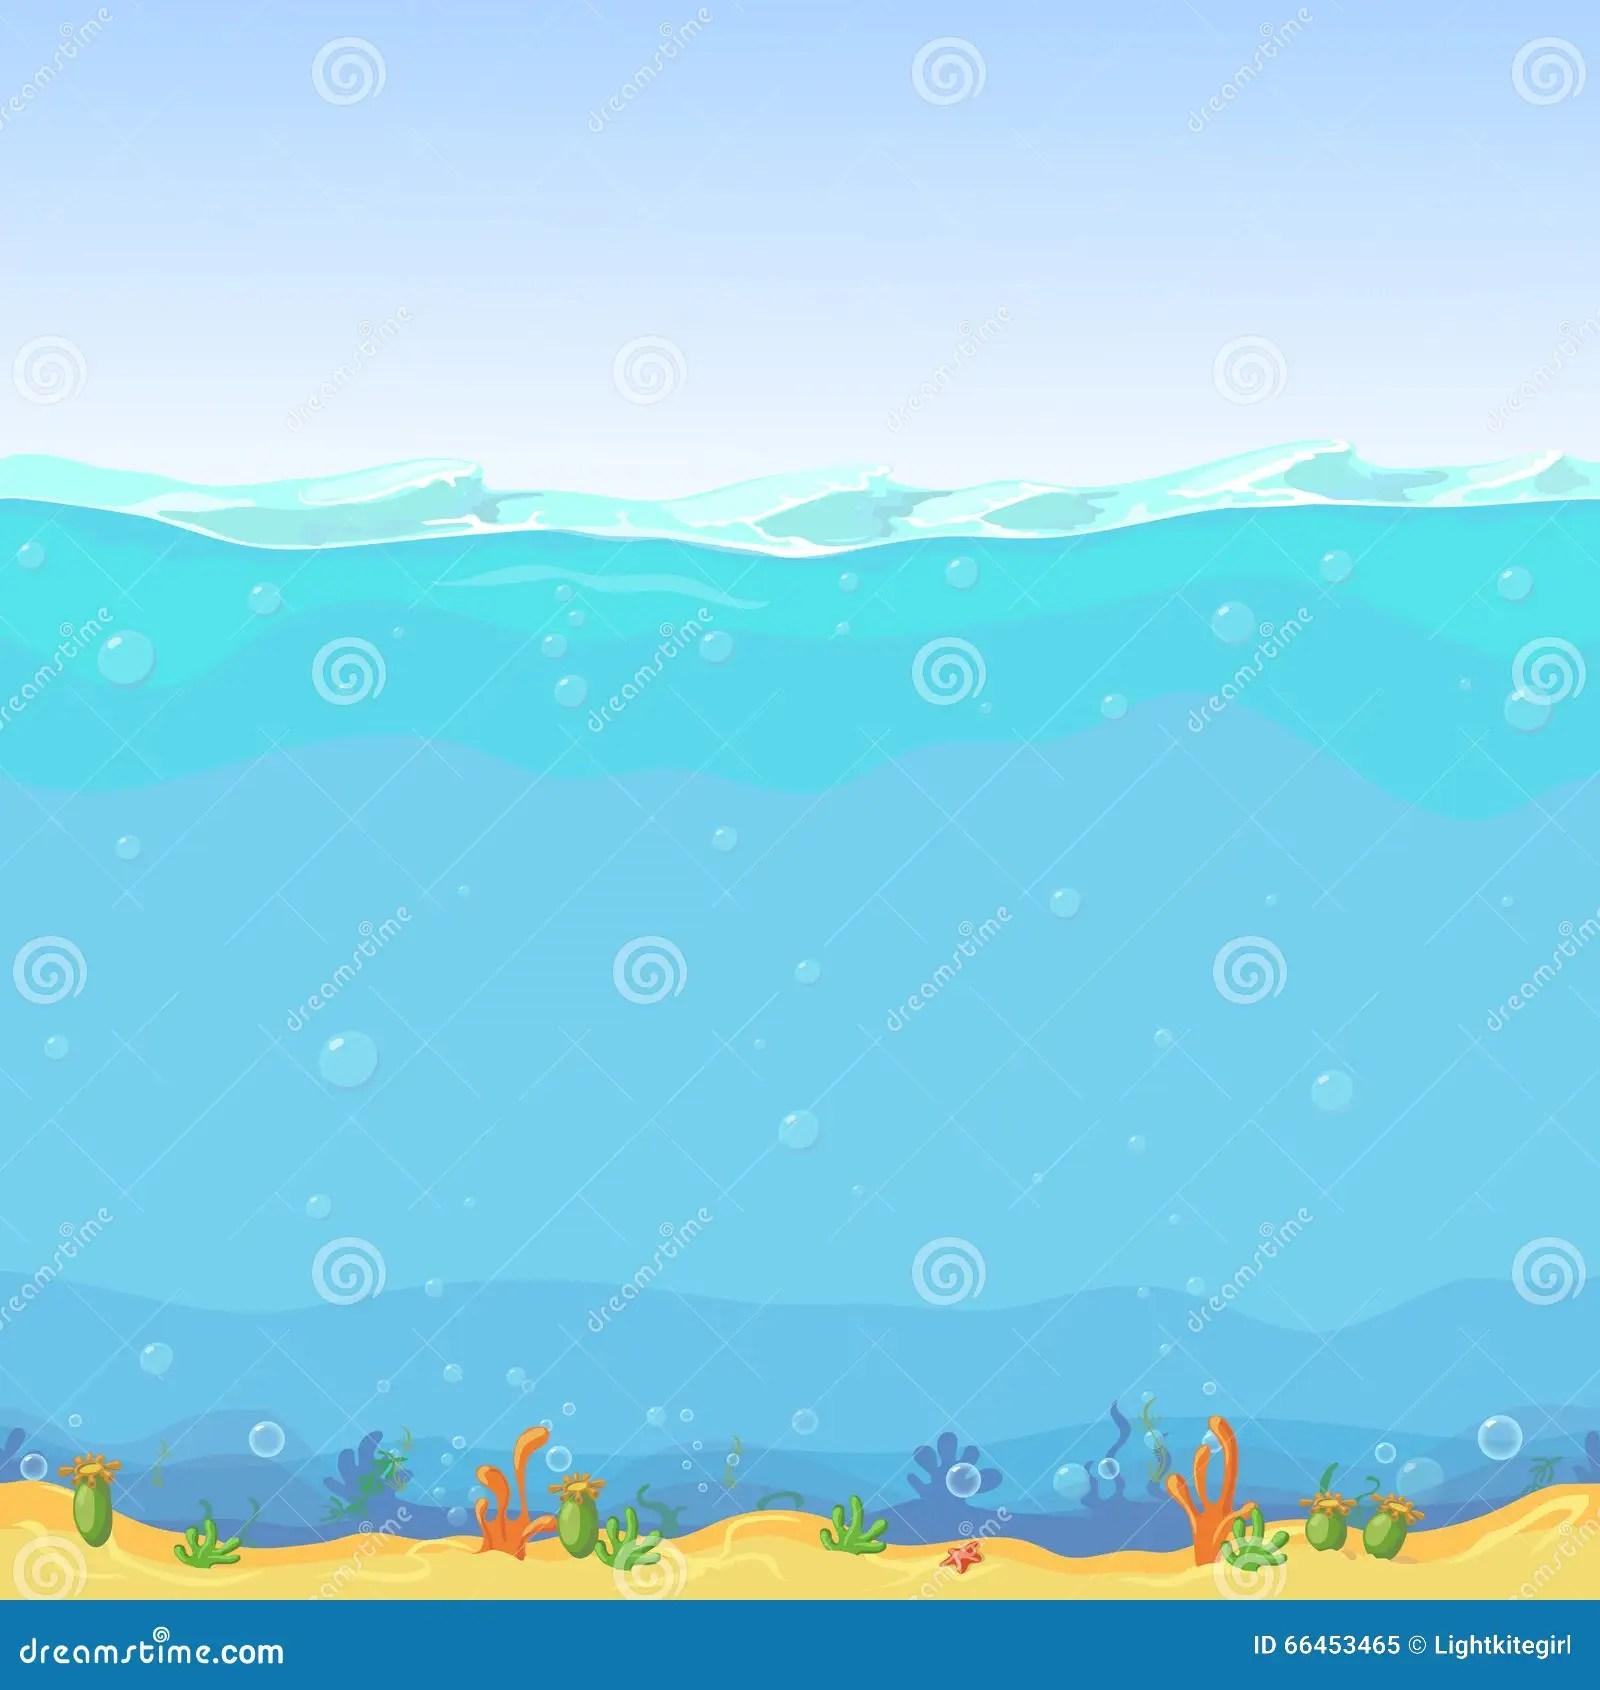 Underwater Seamless Landscape Cartoon Background For Game